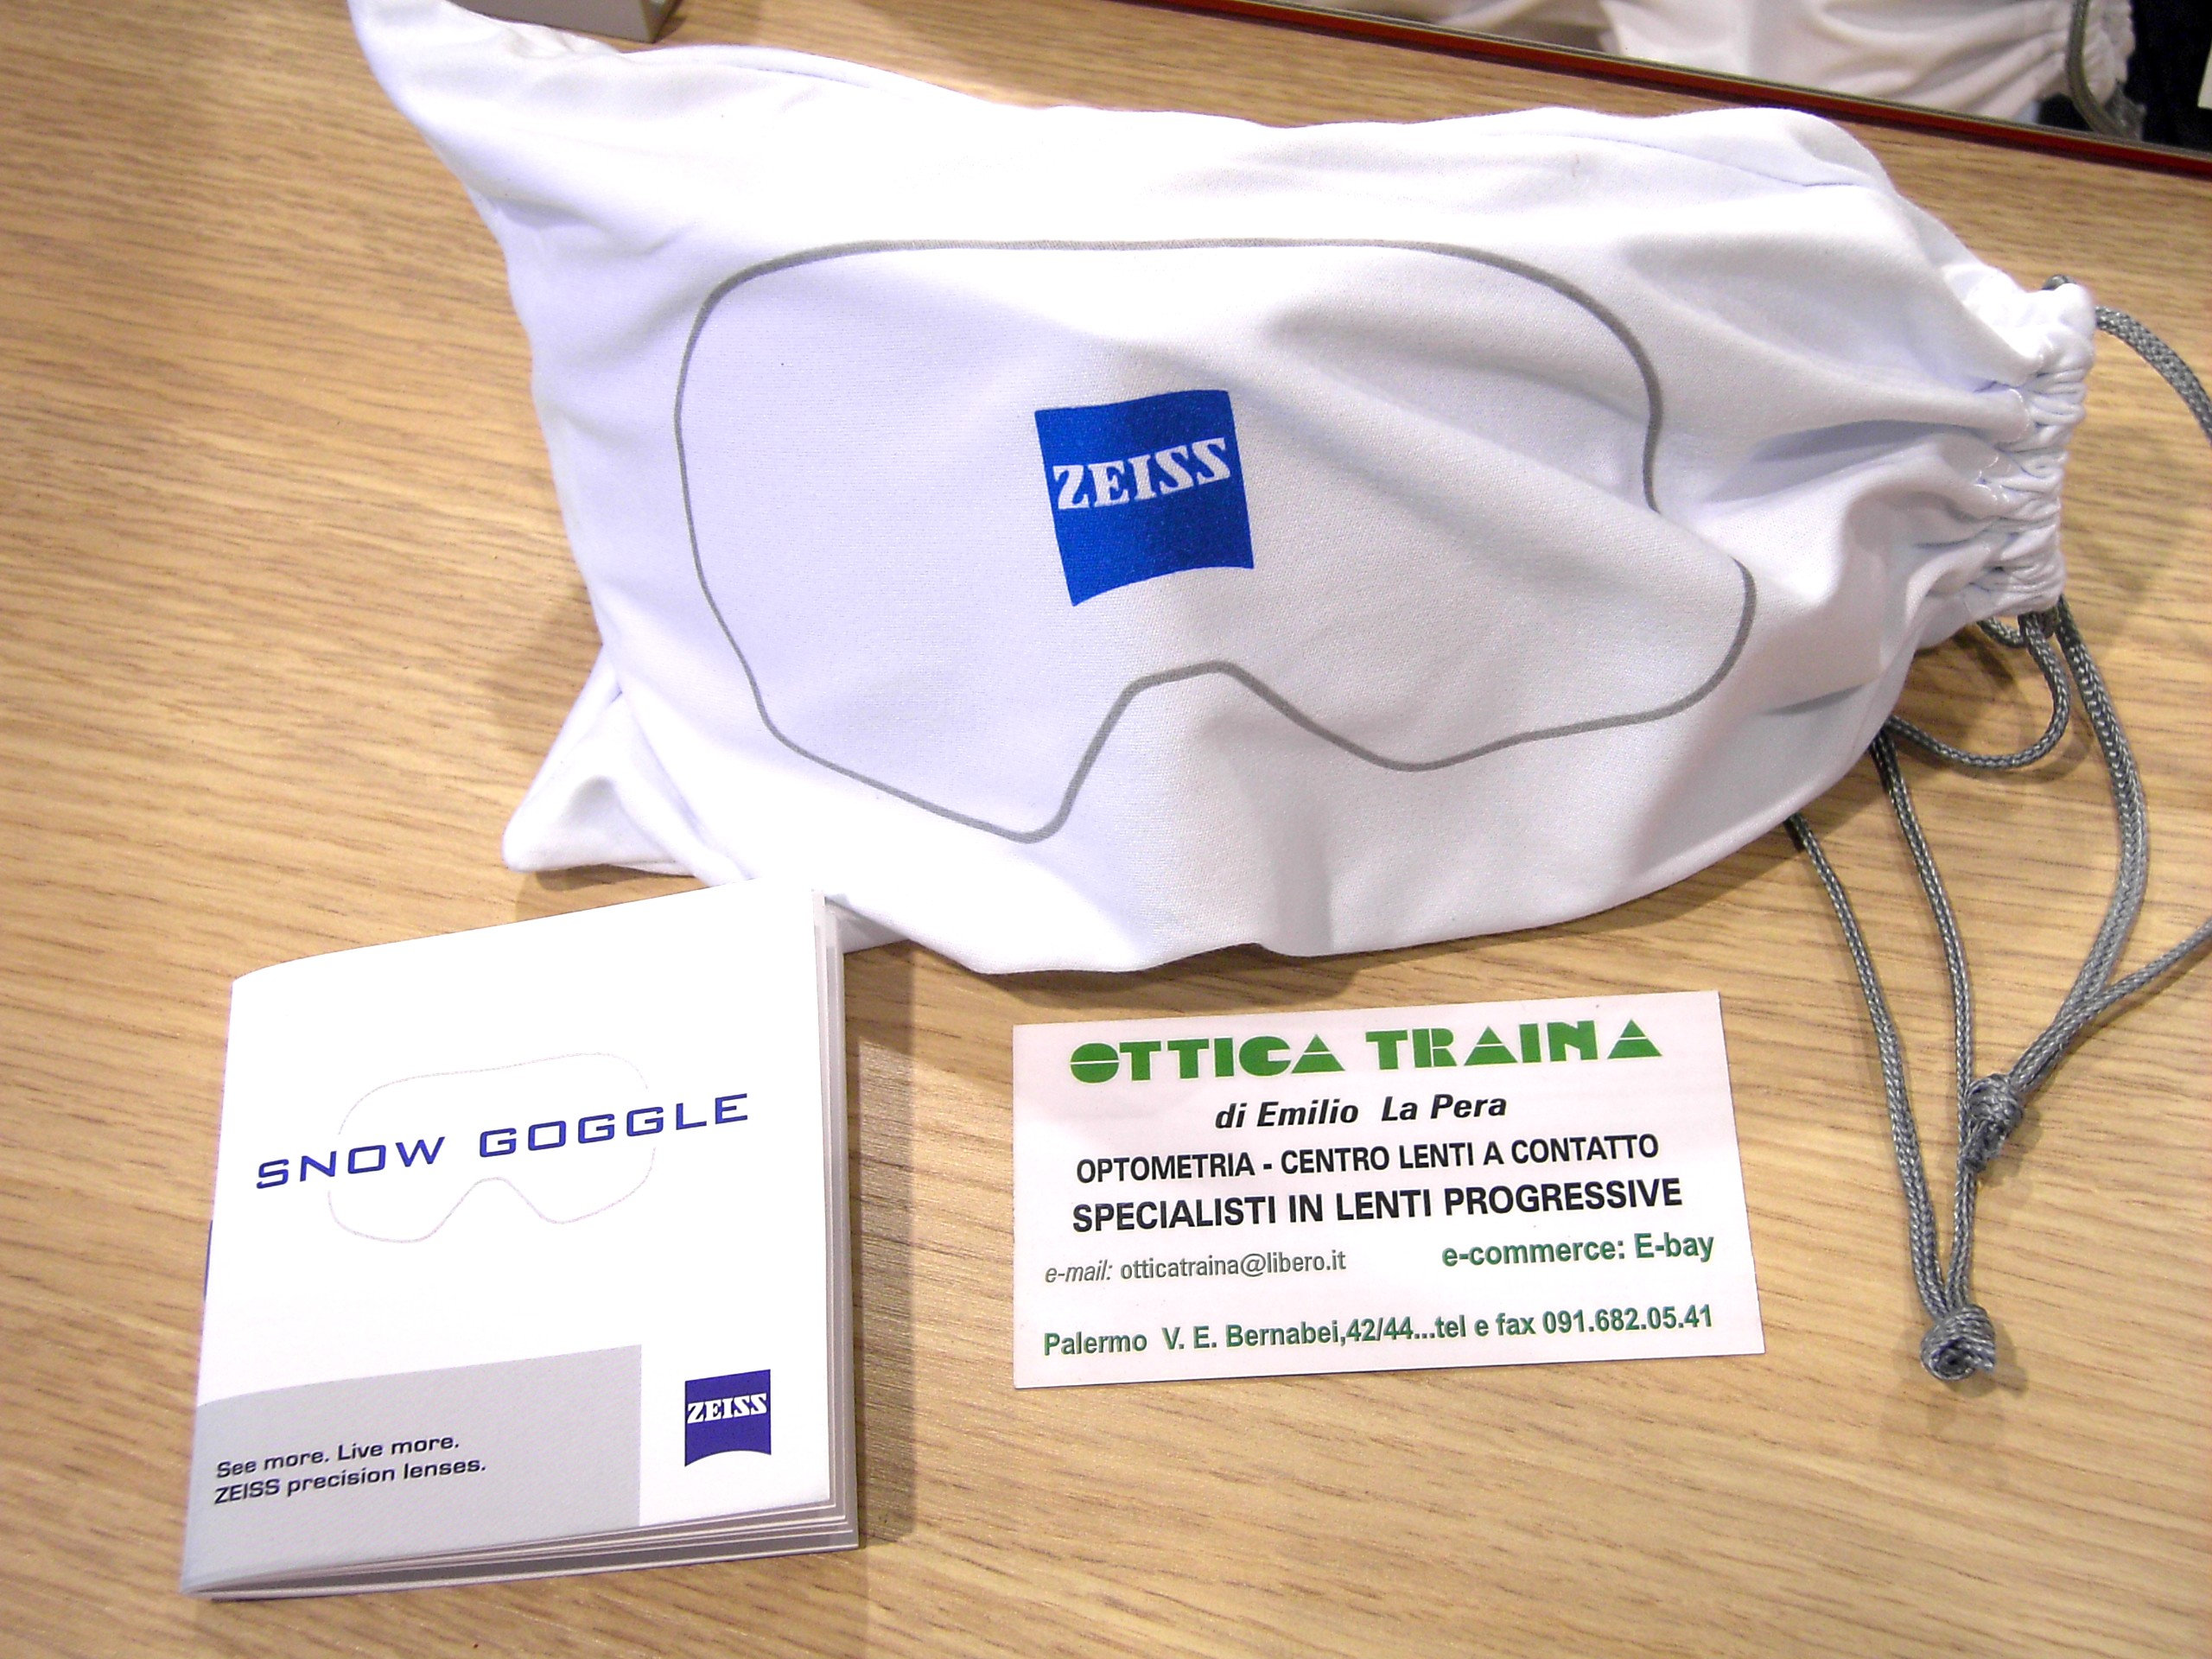 55ccfffe73 Ski Mask ZEISS RACER POLARIZED LENS ROSE Ski Goggles